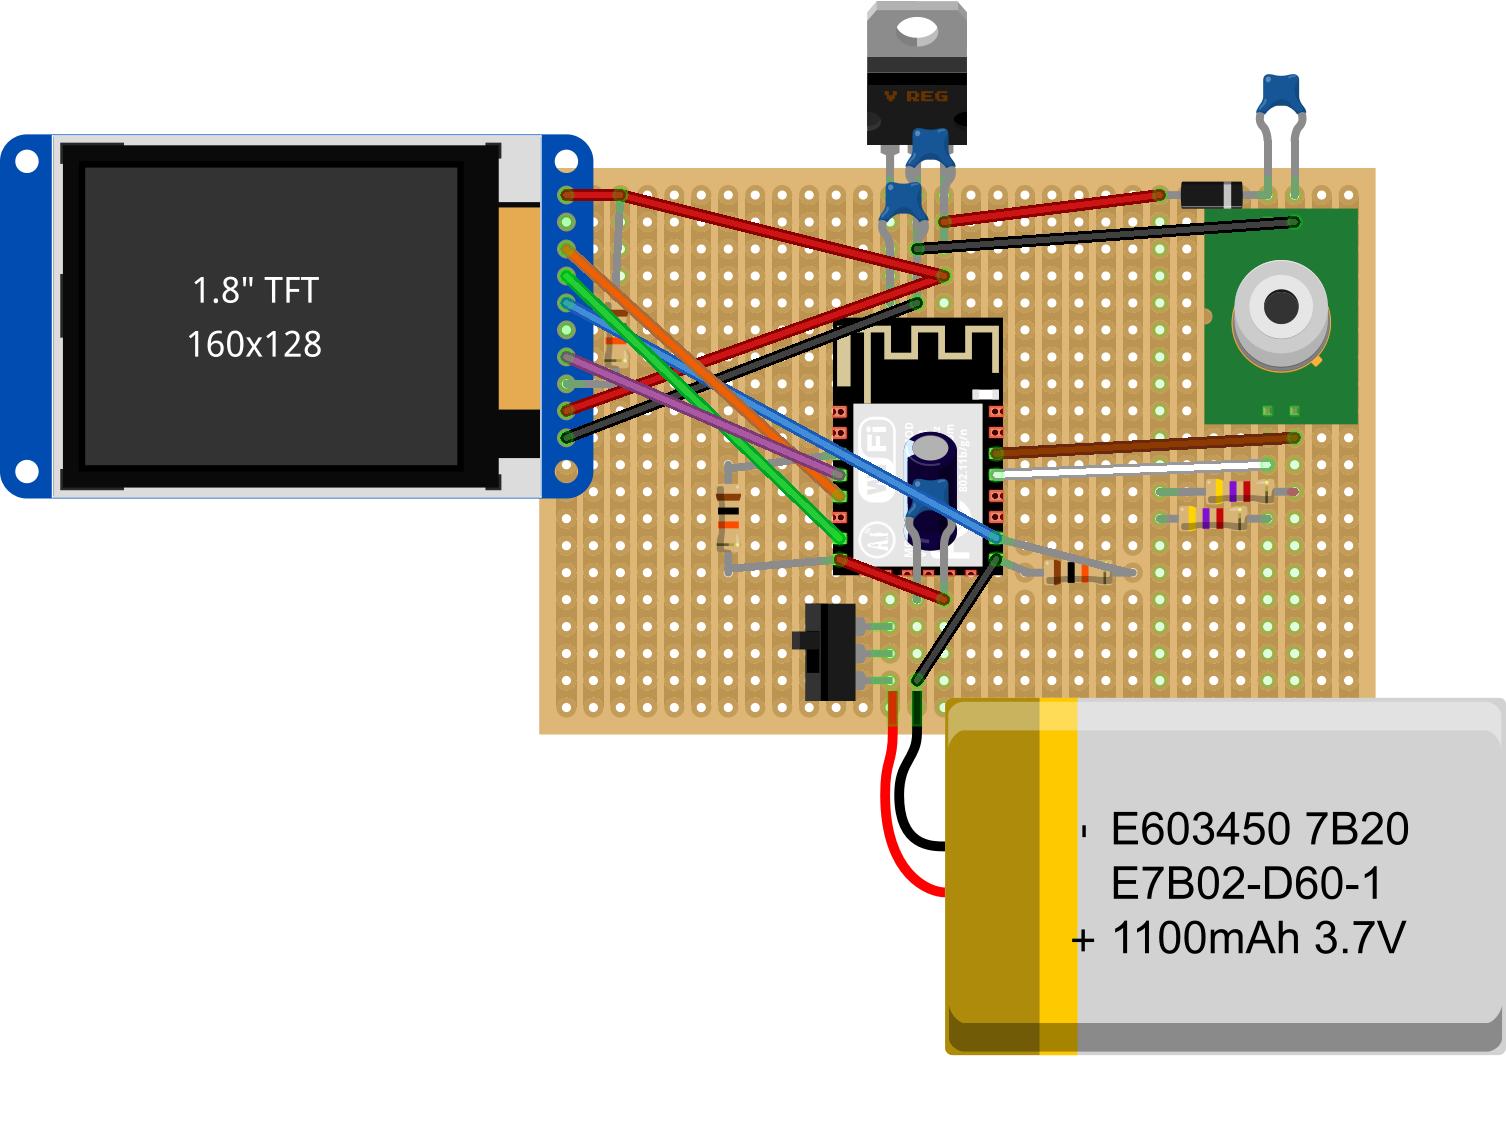 Termika Fotilo schema using an ESP8266